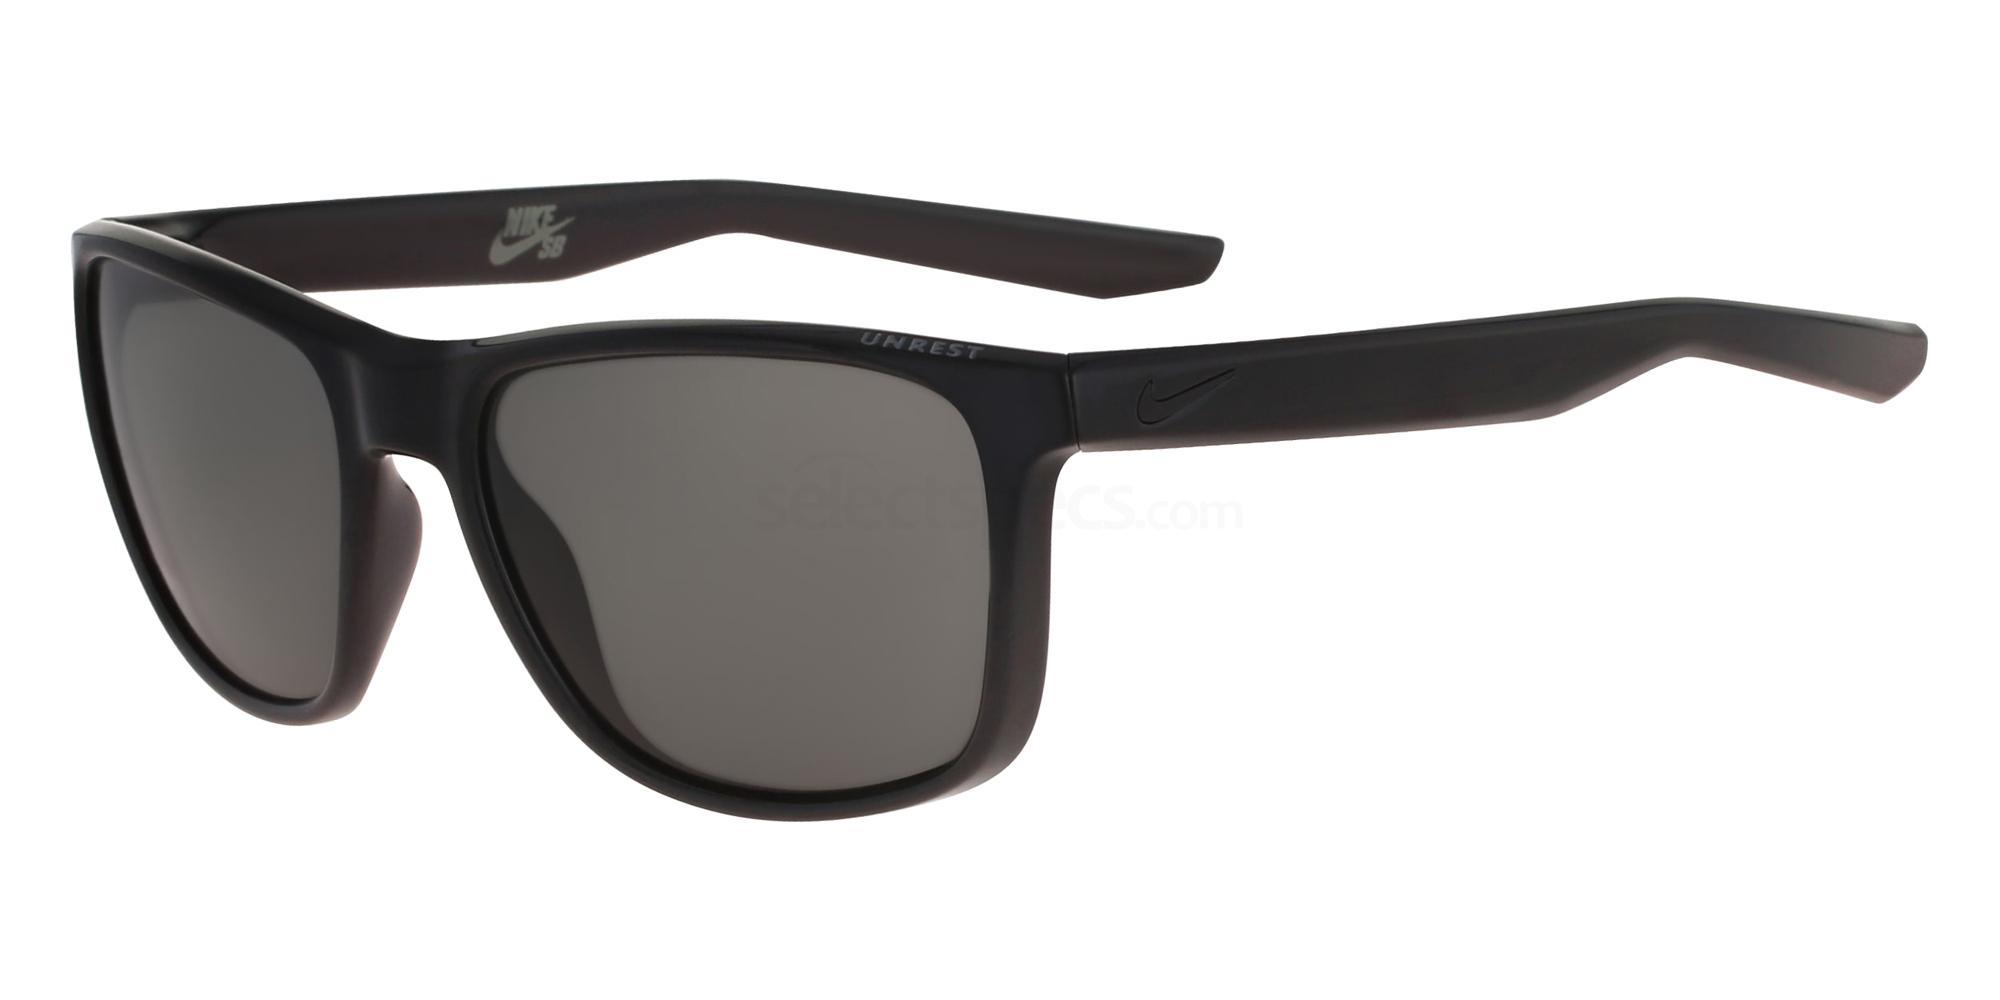 001 UNREST EV0921 Sunglasses, Nike